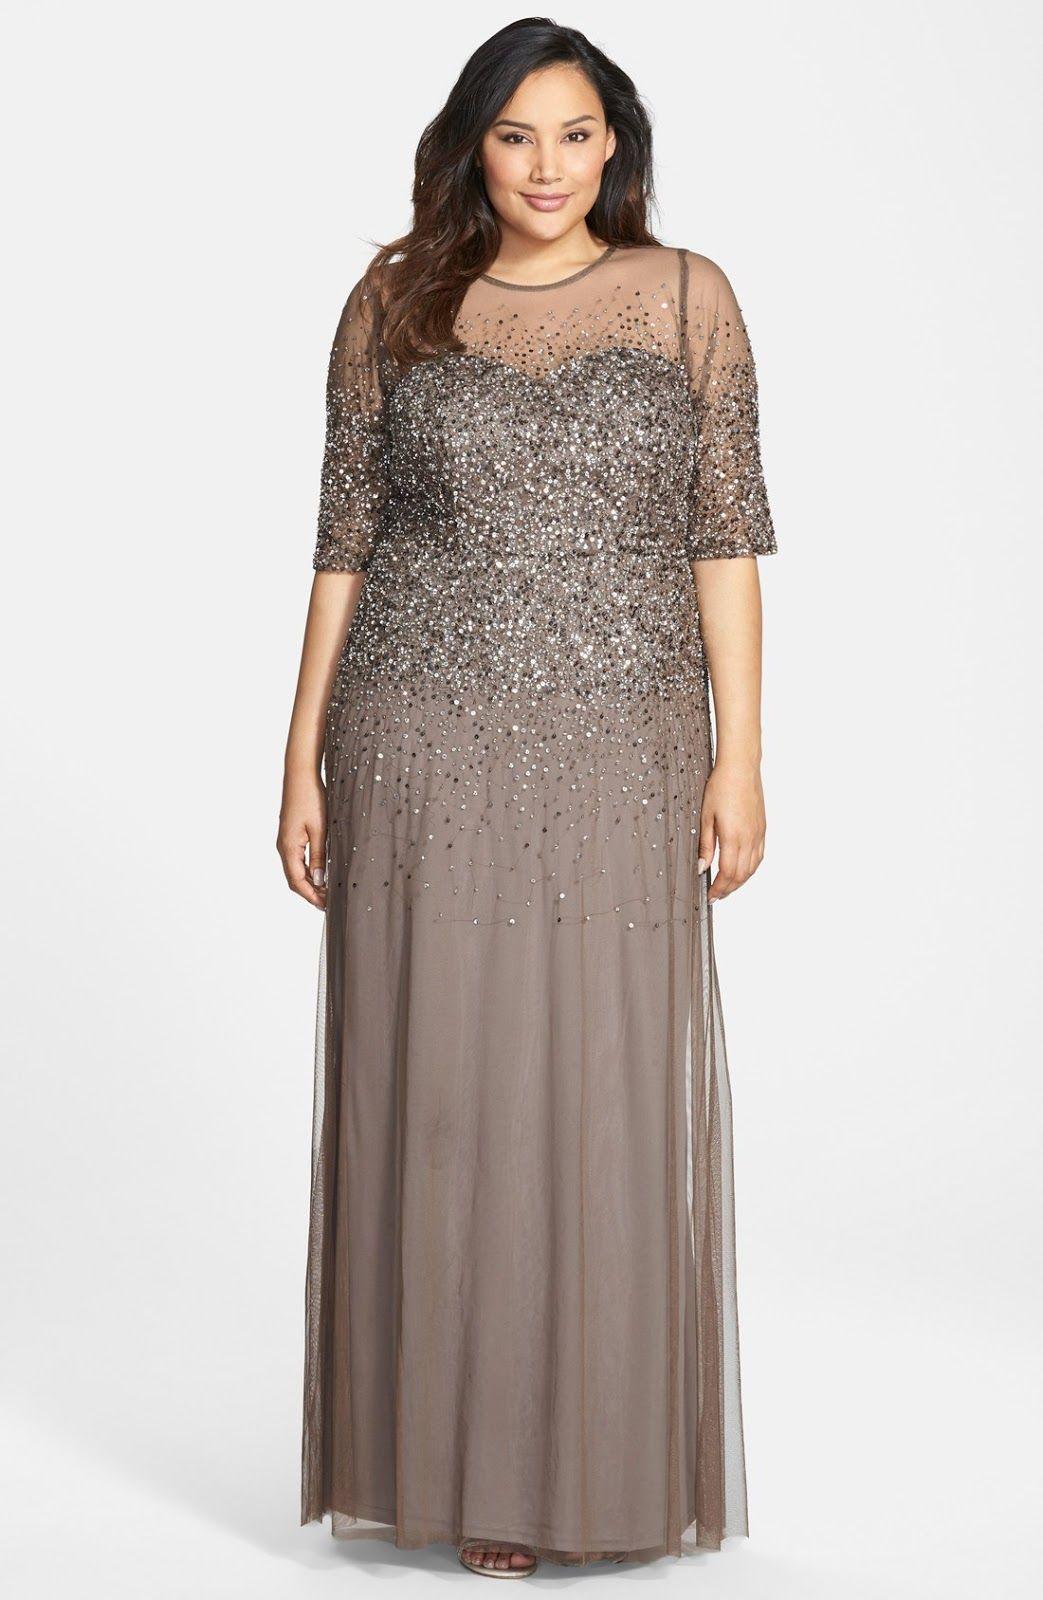 Modas de vestidos largos para gorditas